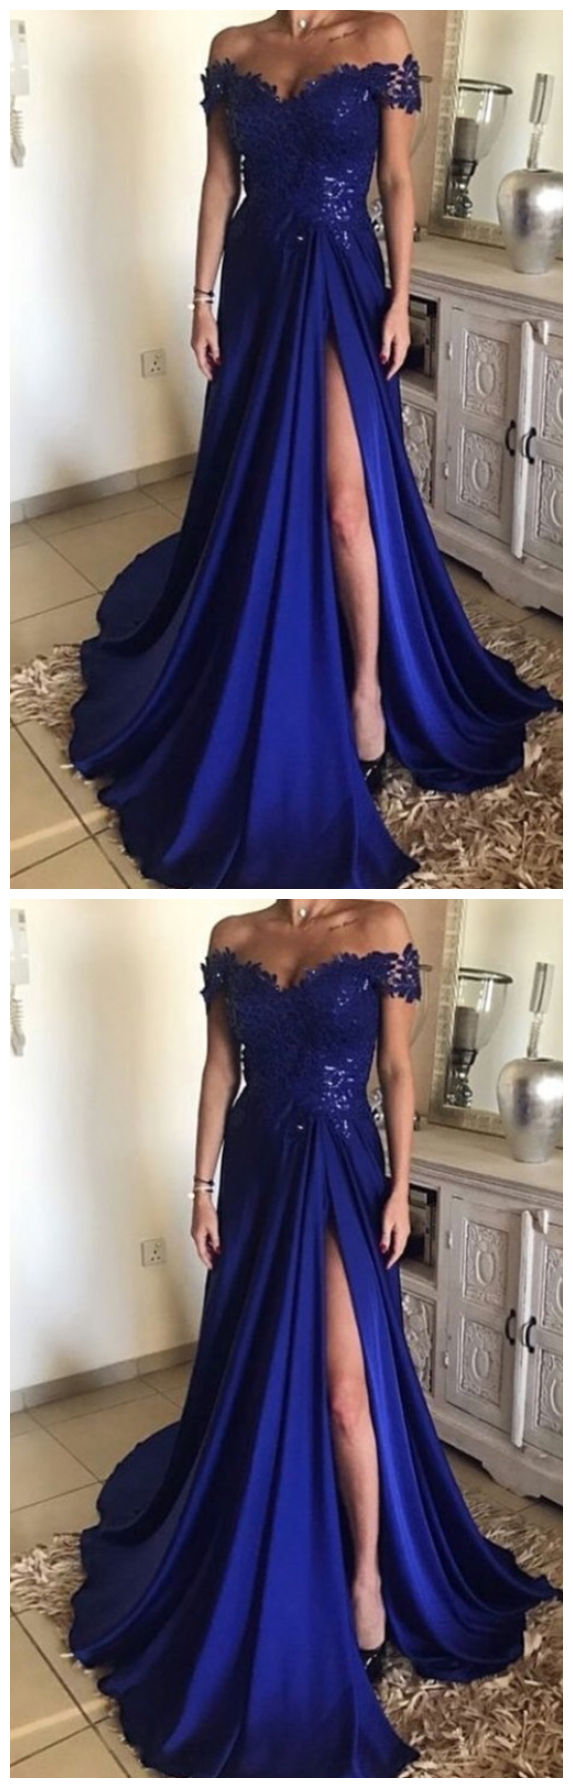 High Slit Evening Dress, A Line Appliques Prom Dress, Dark Blue Long Prom